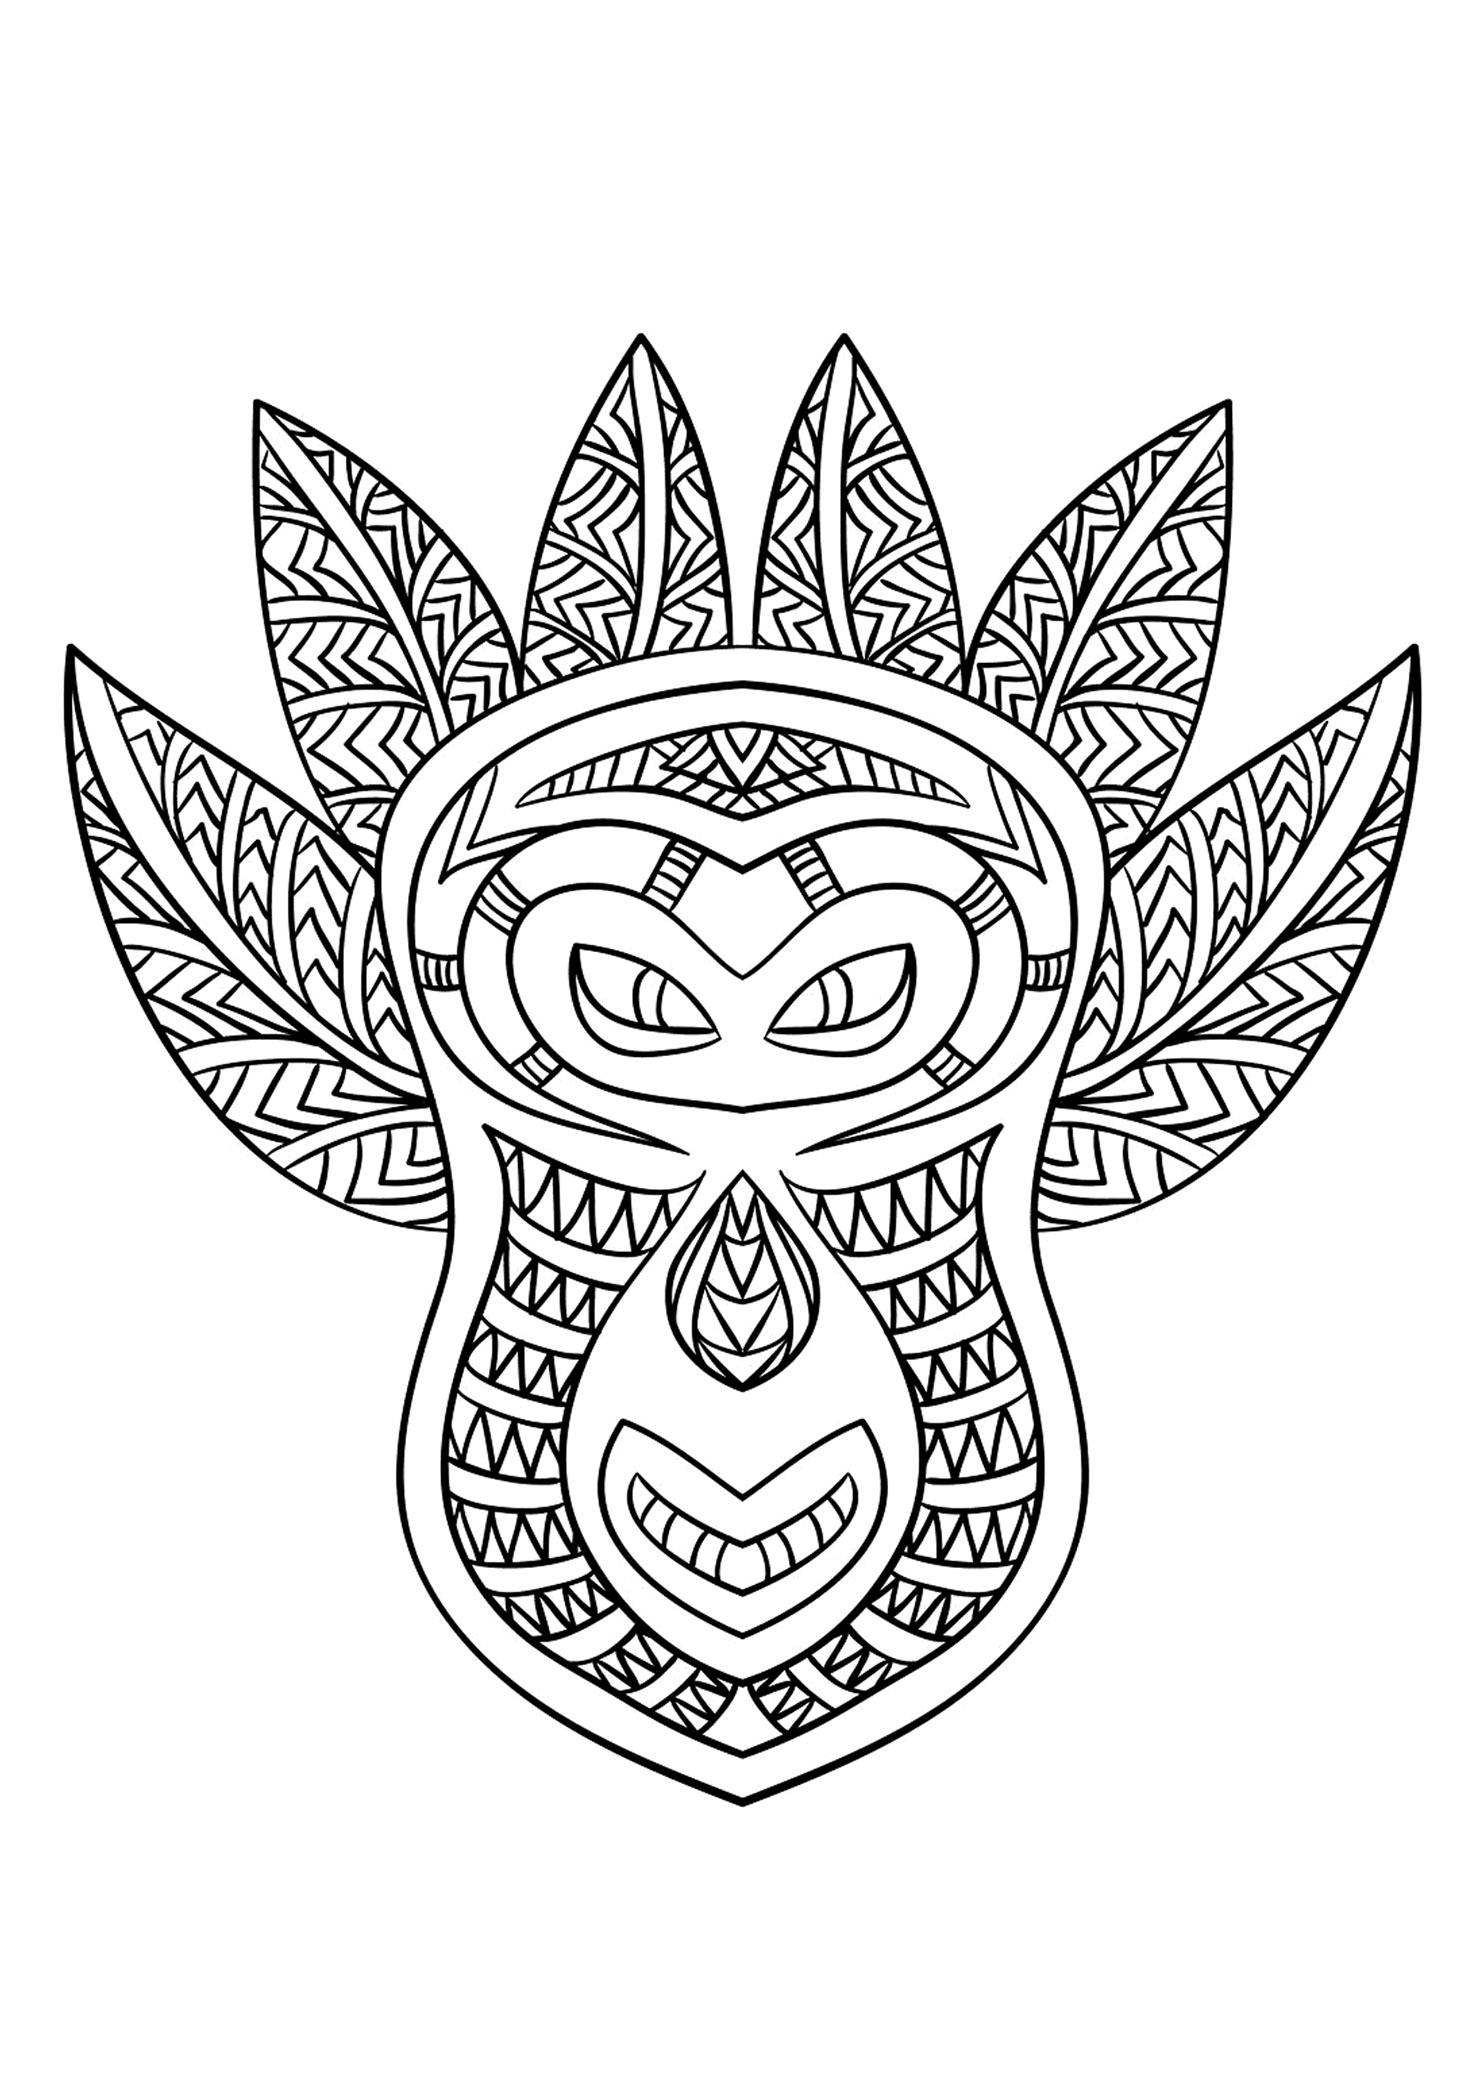 Masque africain dessin ei58 jornalagora - Dessin de masque africain ...